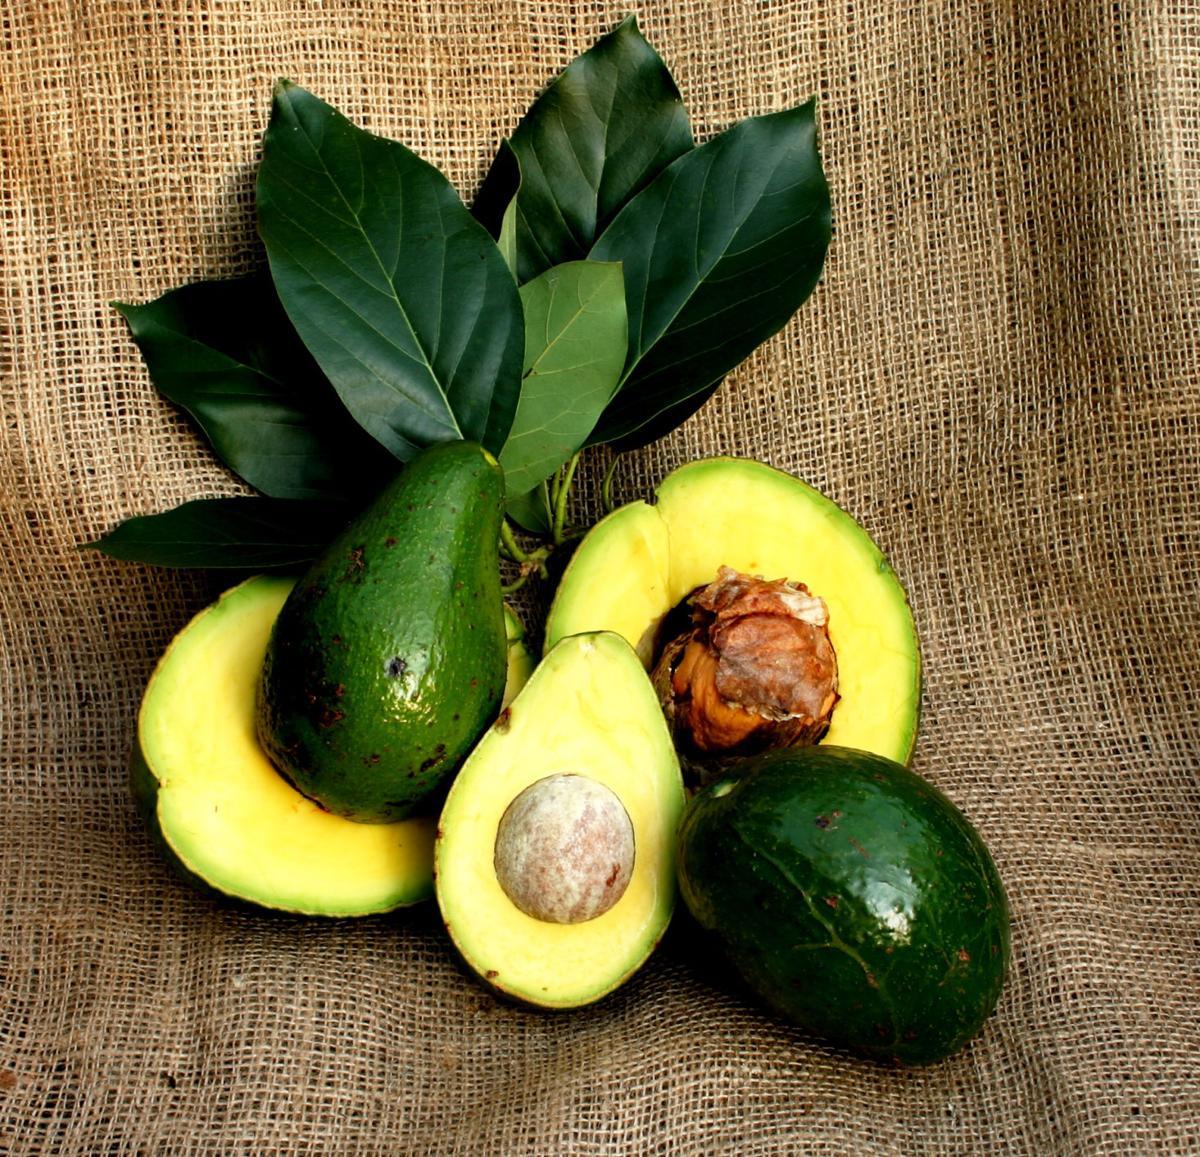 September's featured fruit - Avocado (Persea Americana)